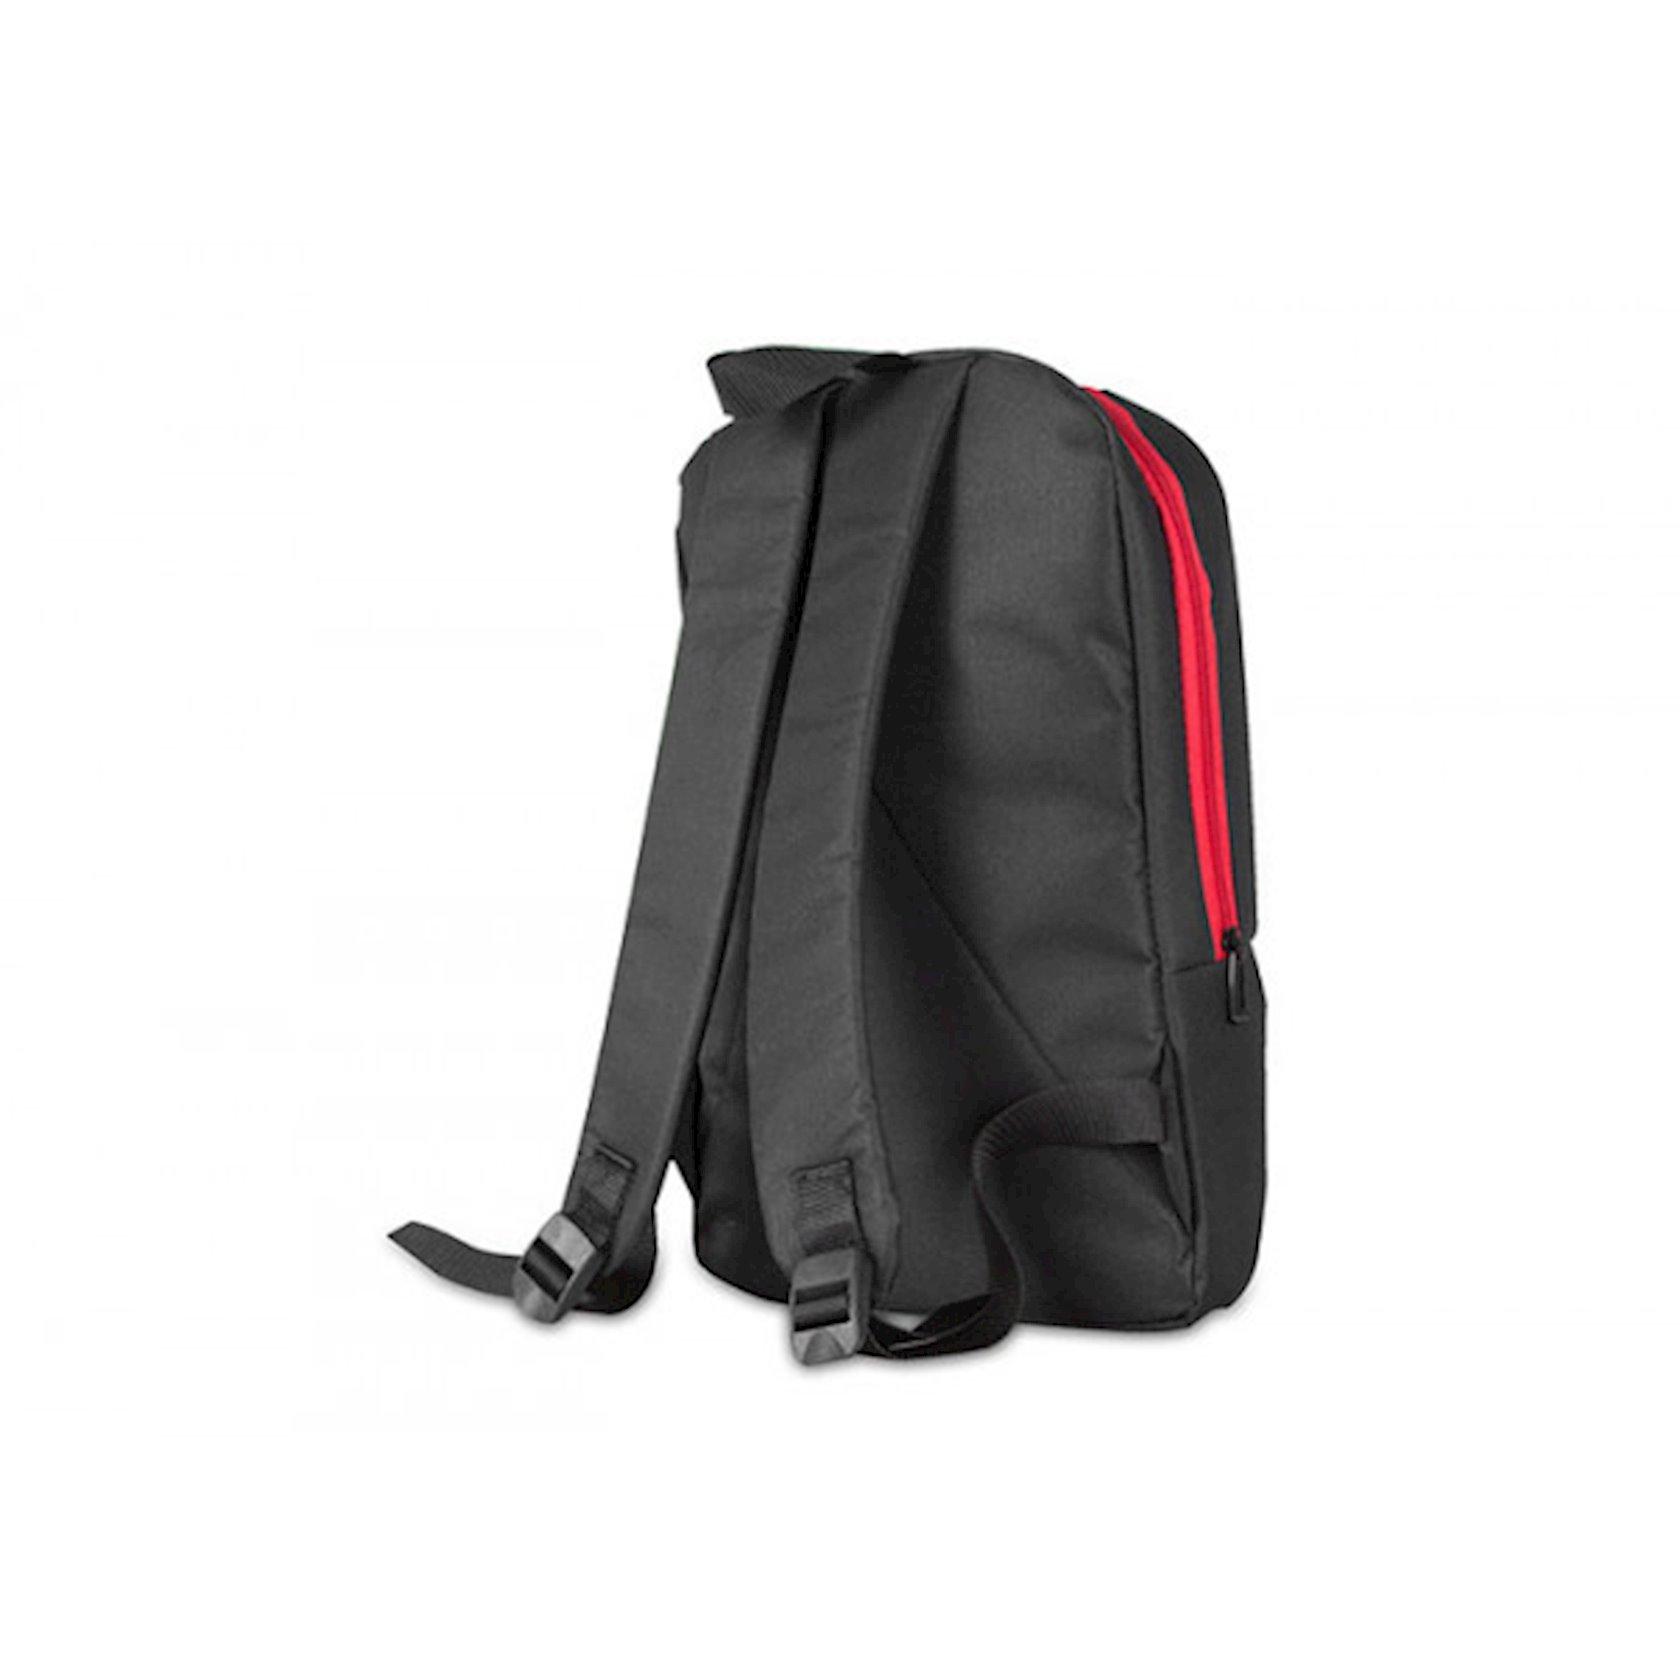 Noutbuk üçün bel çantası Addison 300447 15.6 inch Black